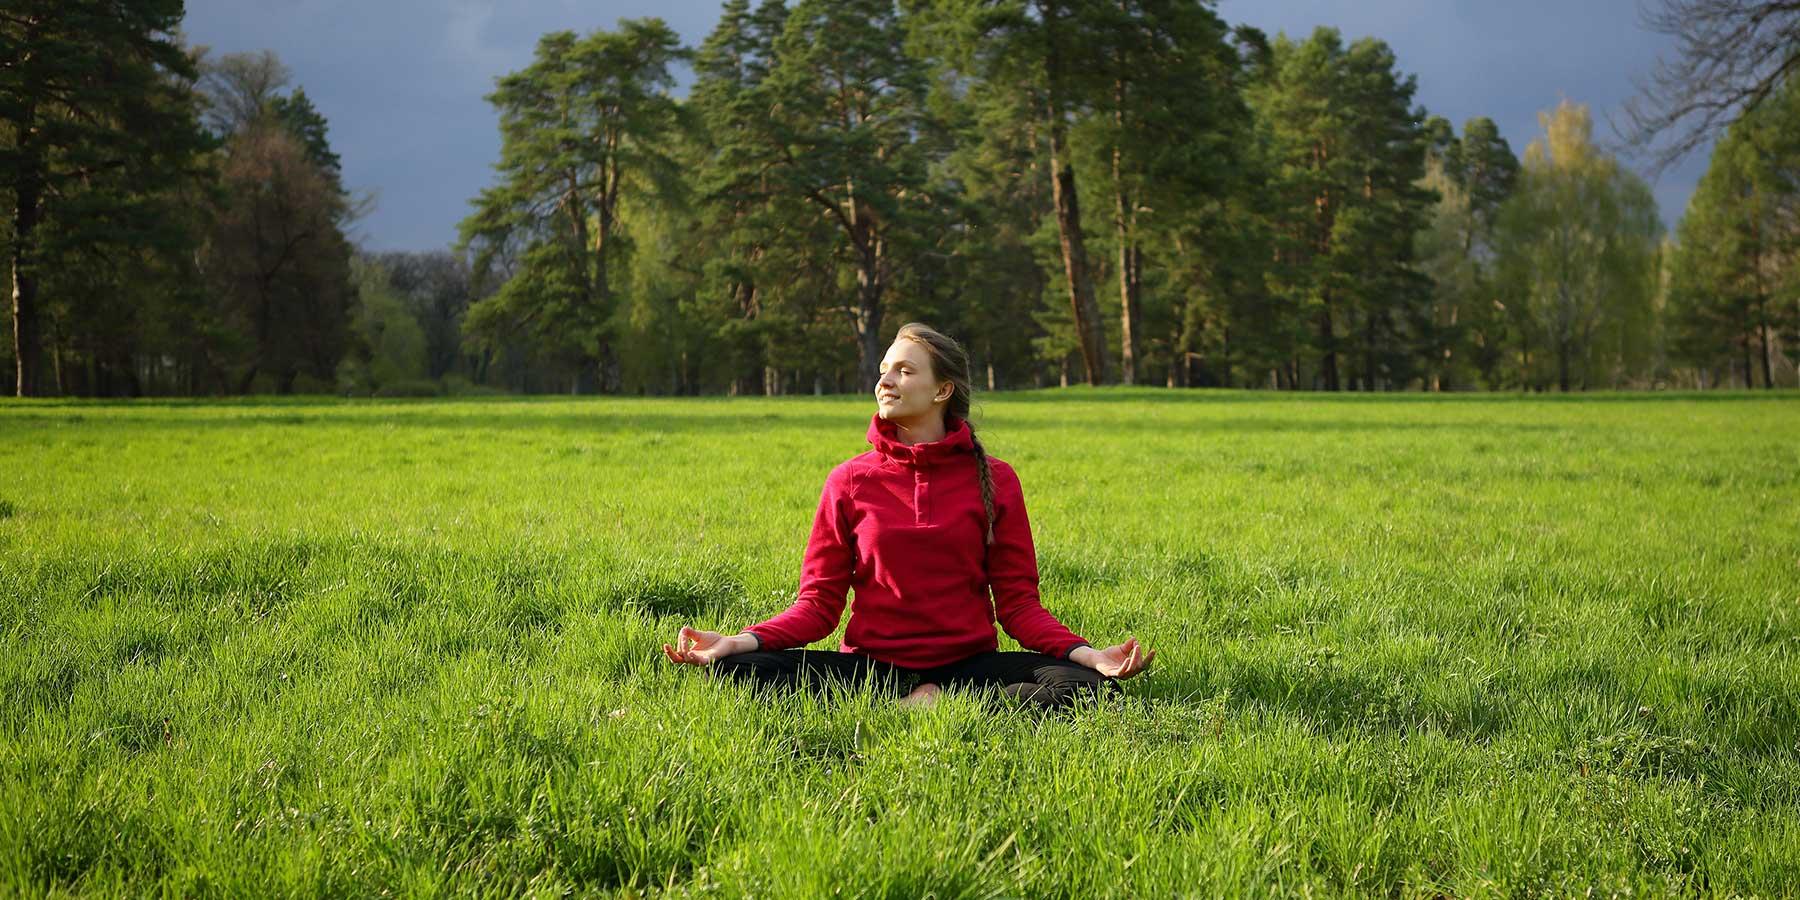 Meditation is attaining awareness